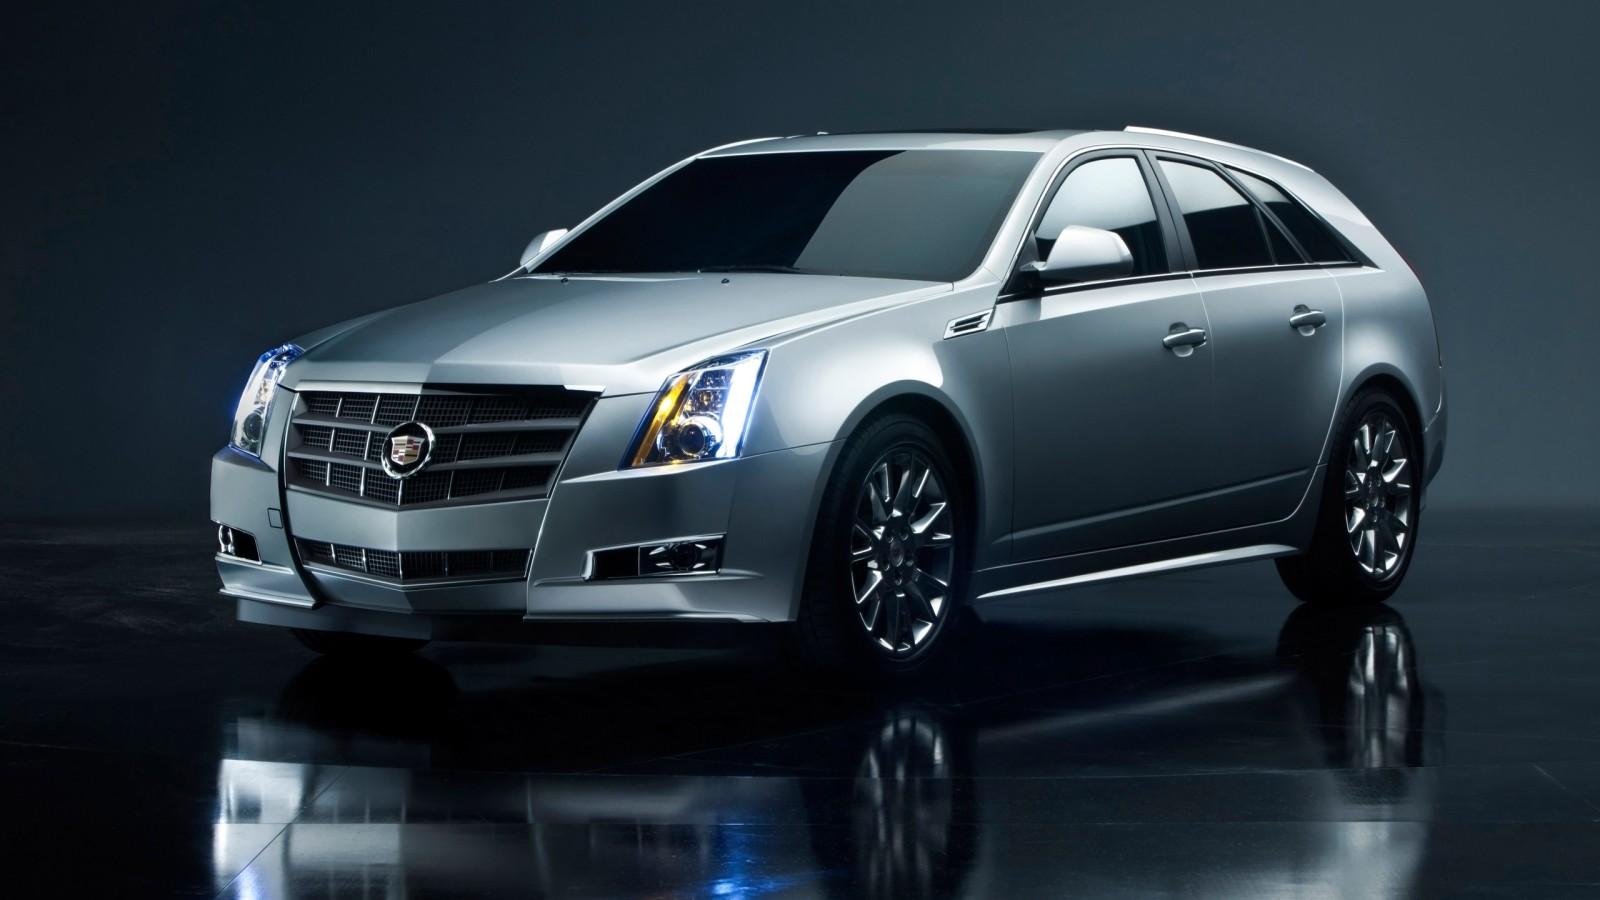 2014 Cadillac CTS Sport Wagon Wallpaper | HD Car ...